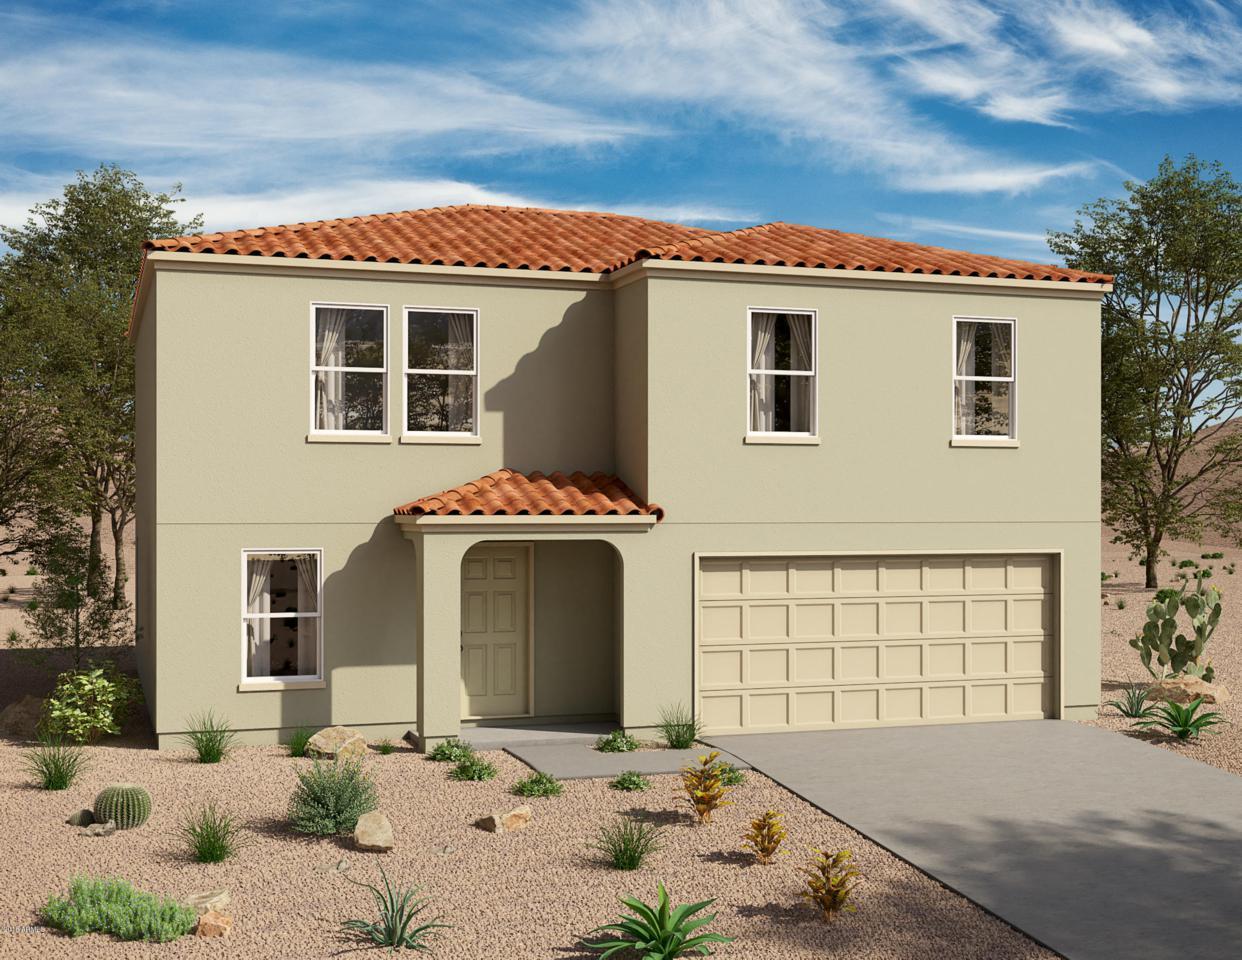 1643 Palo Verde Drive - Photo 1